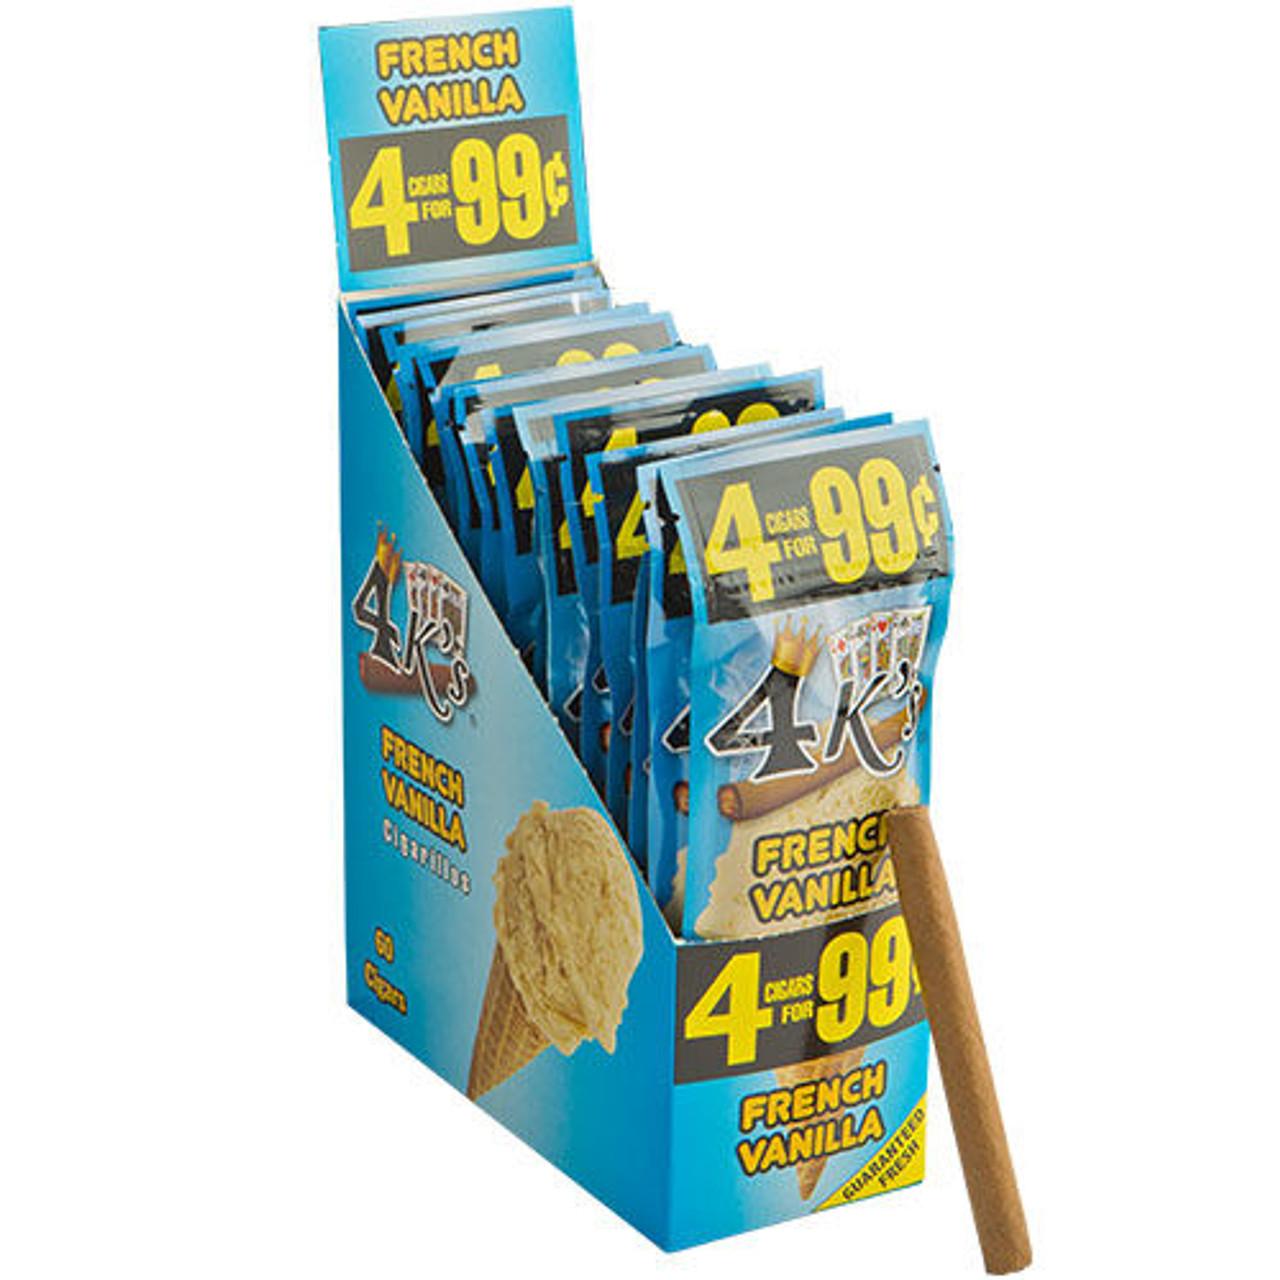 Good Times 4 K's Cigarillos French Vanilla Cigars - 4.25 x 28 (15 Packs of 4 (60 Total))